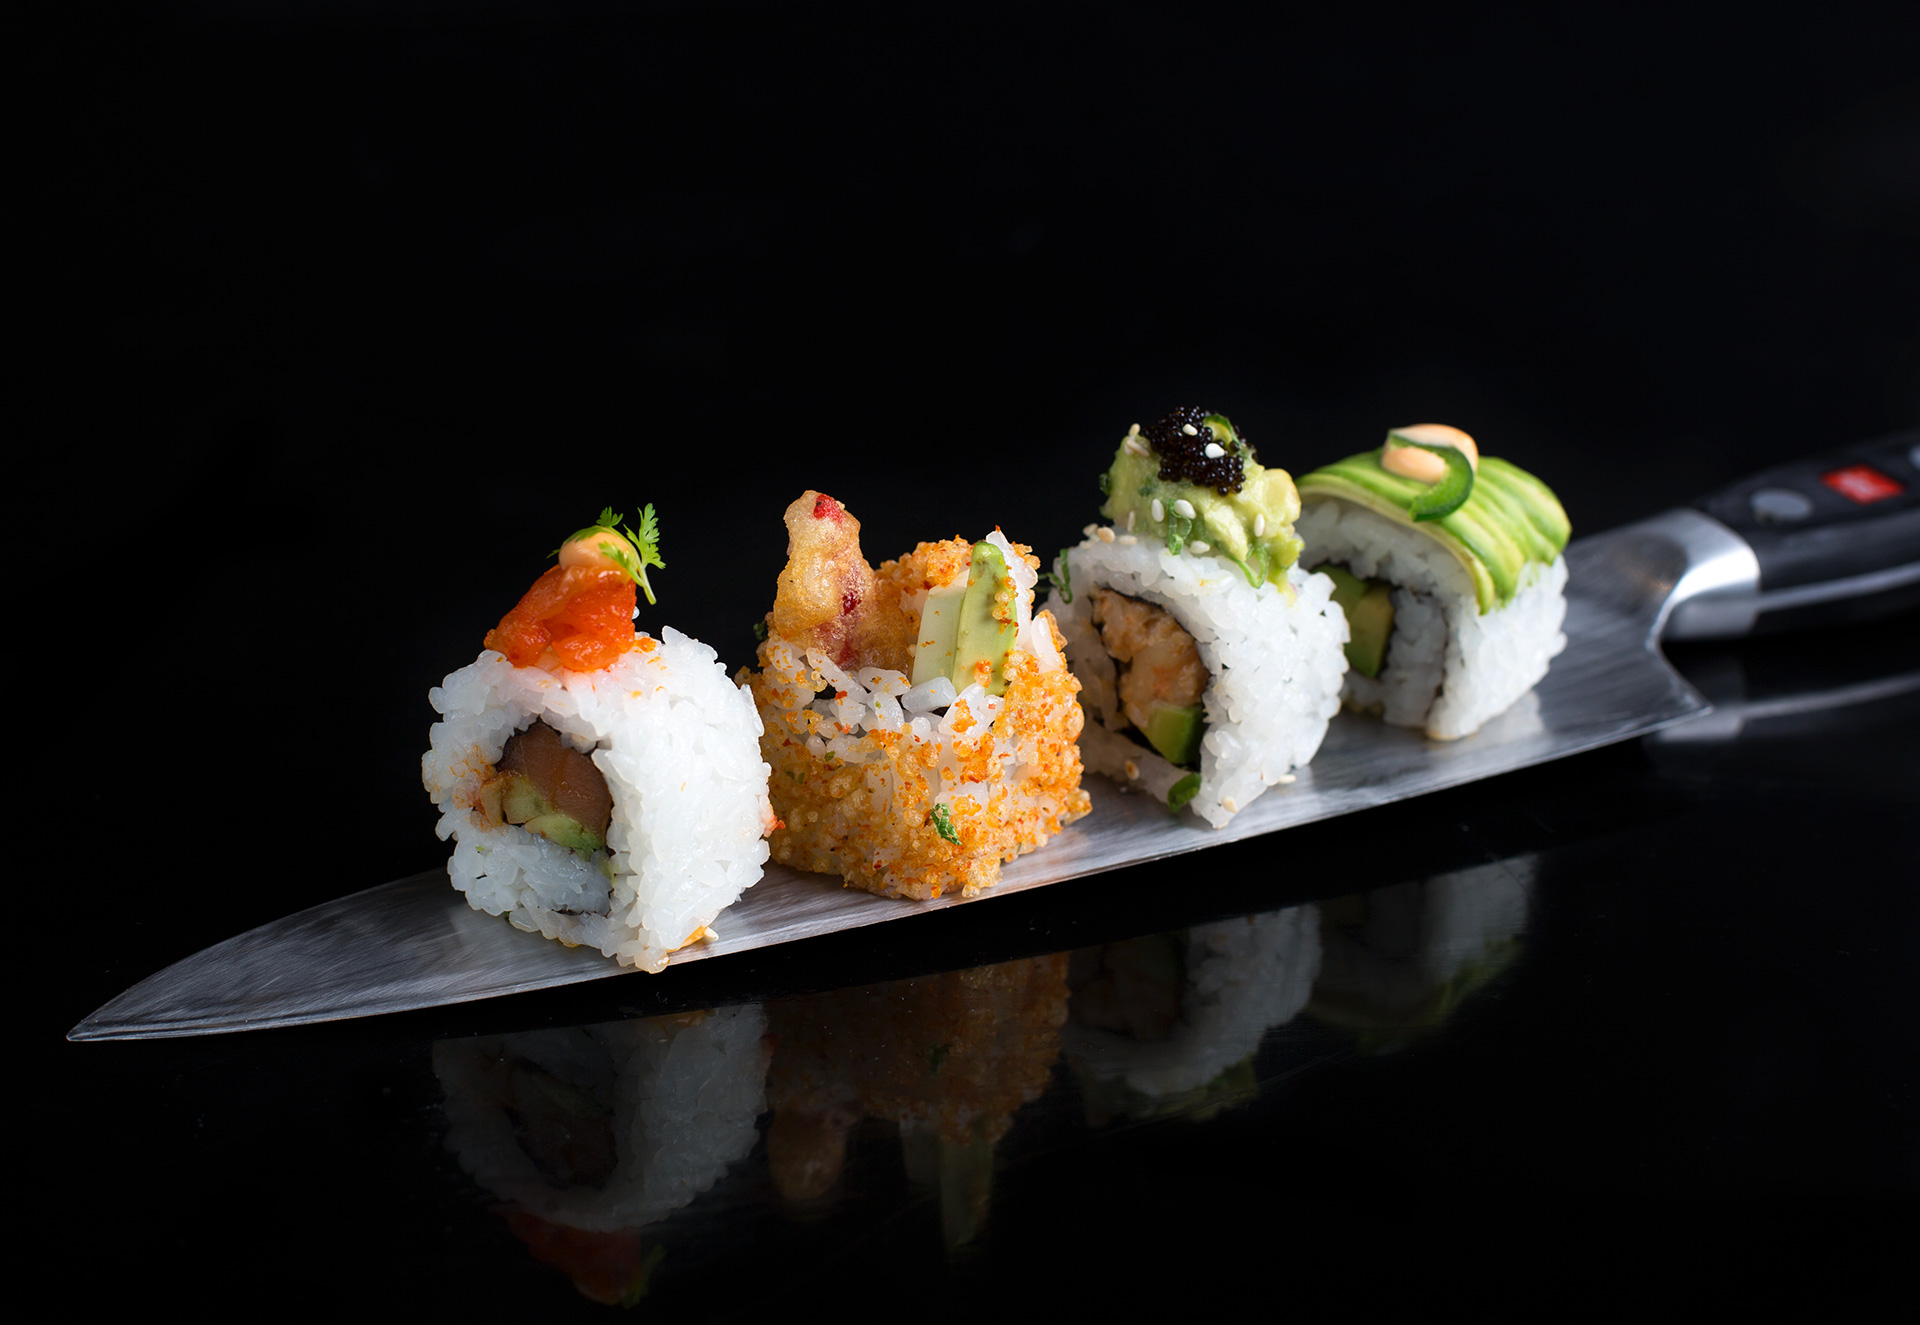 Sushi-On-Knife-KOKO.jpg